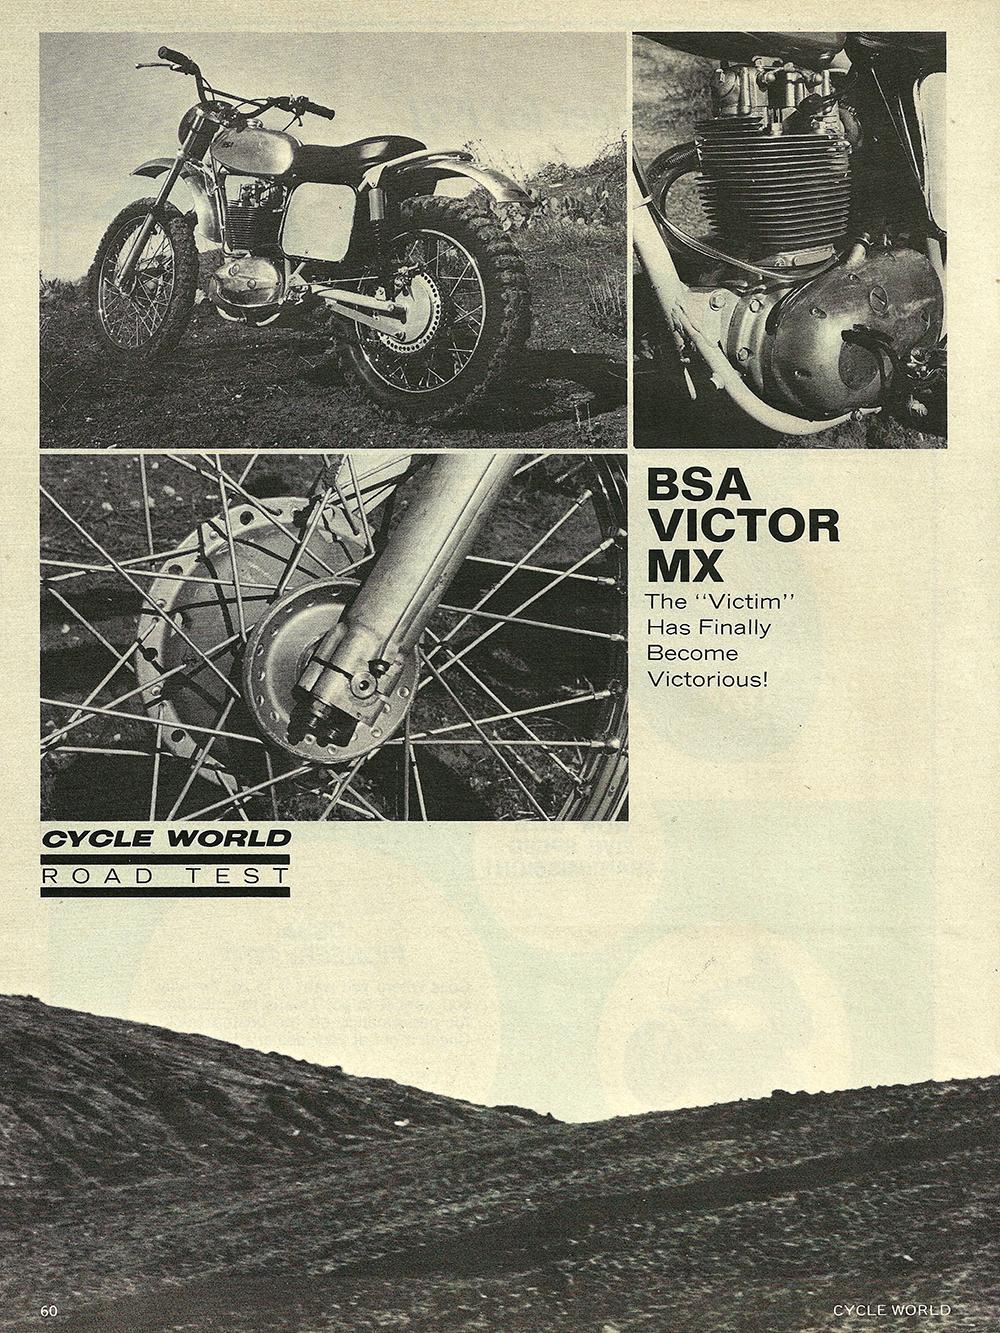 1971 BSA Victor MX road test 01.jpg